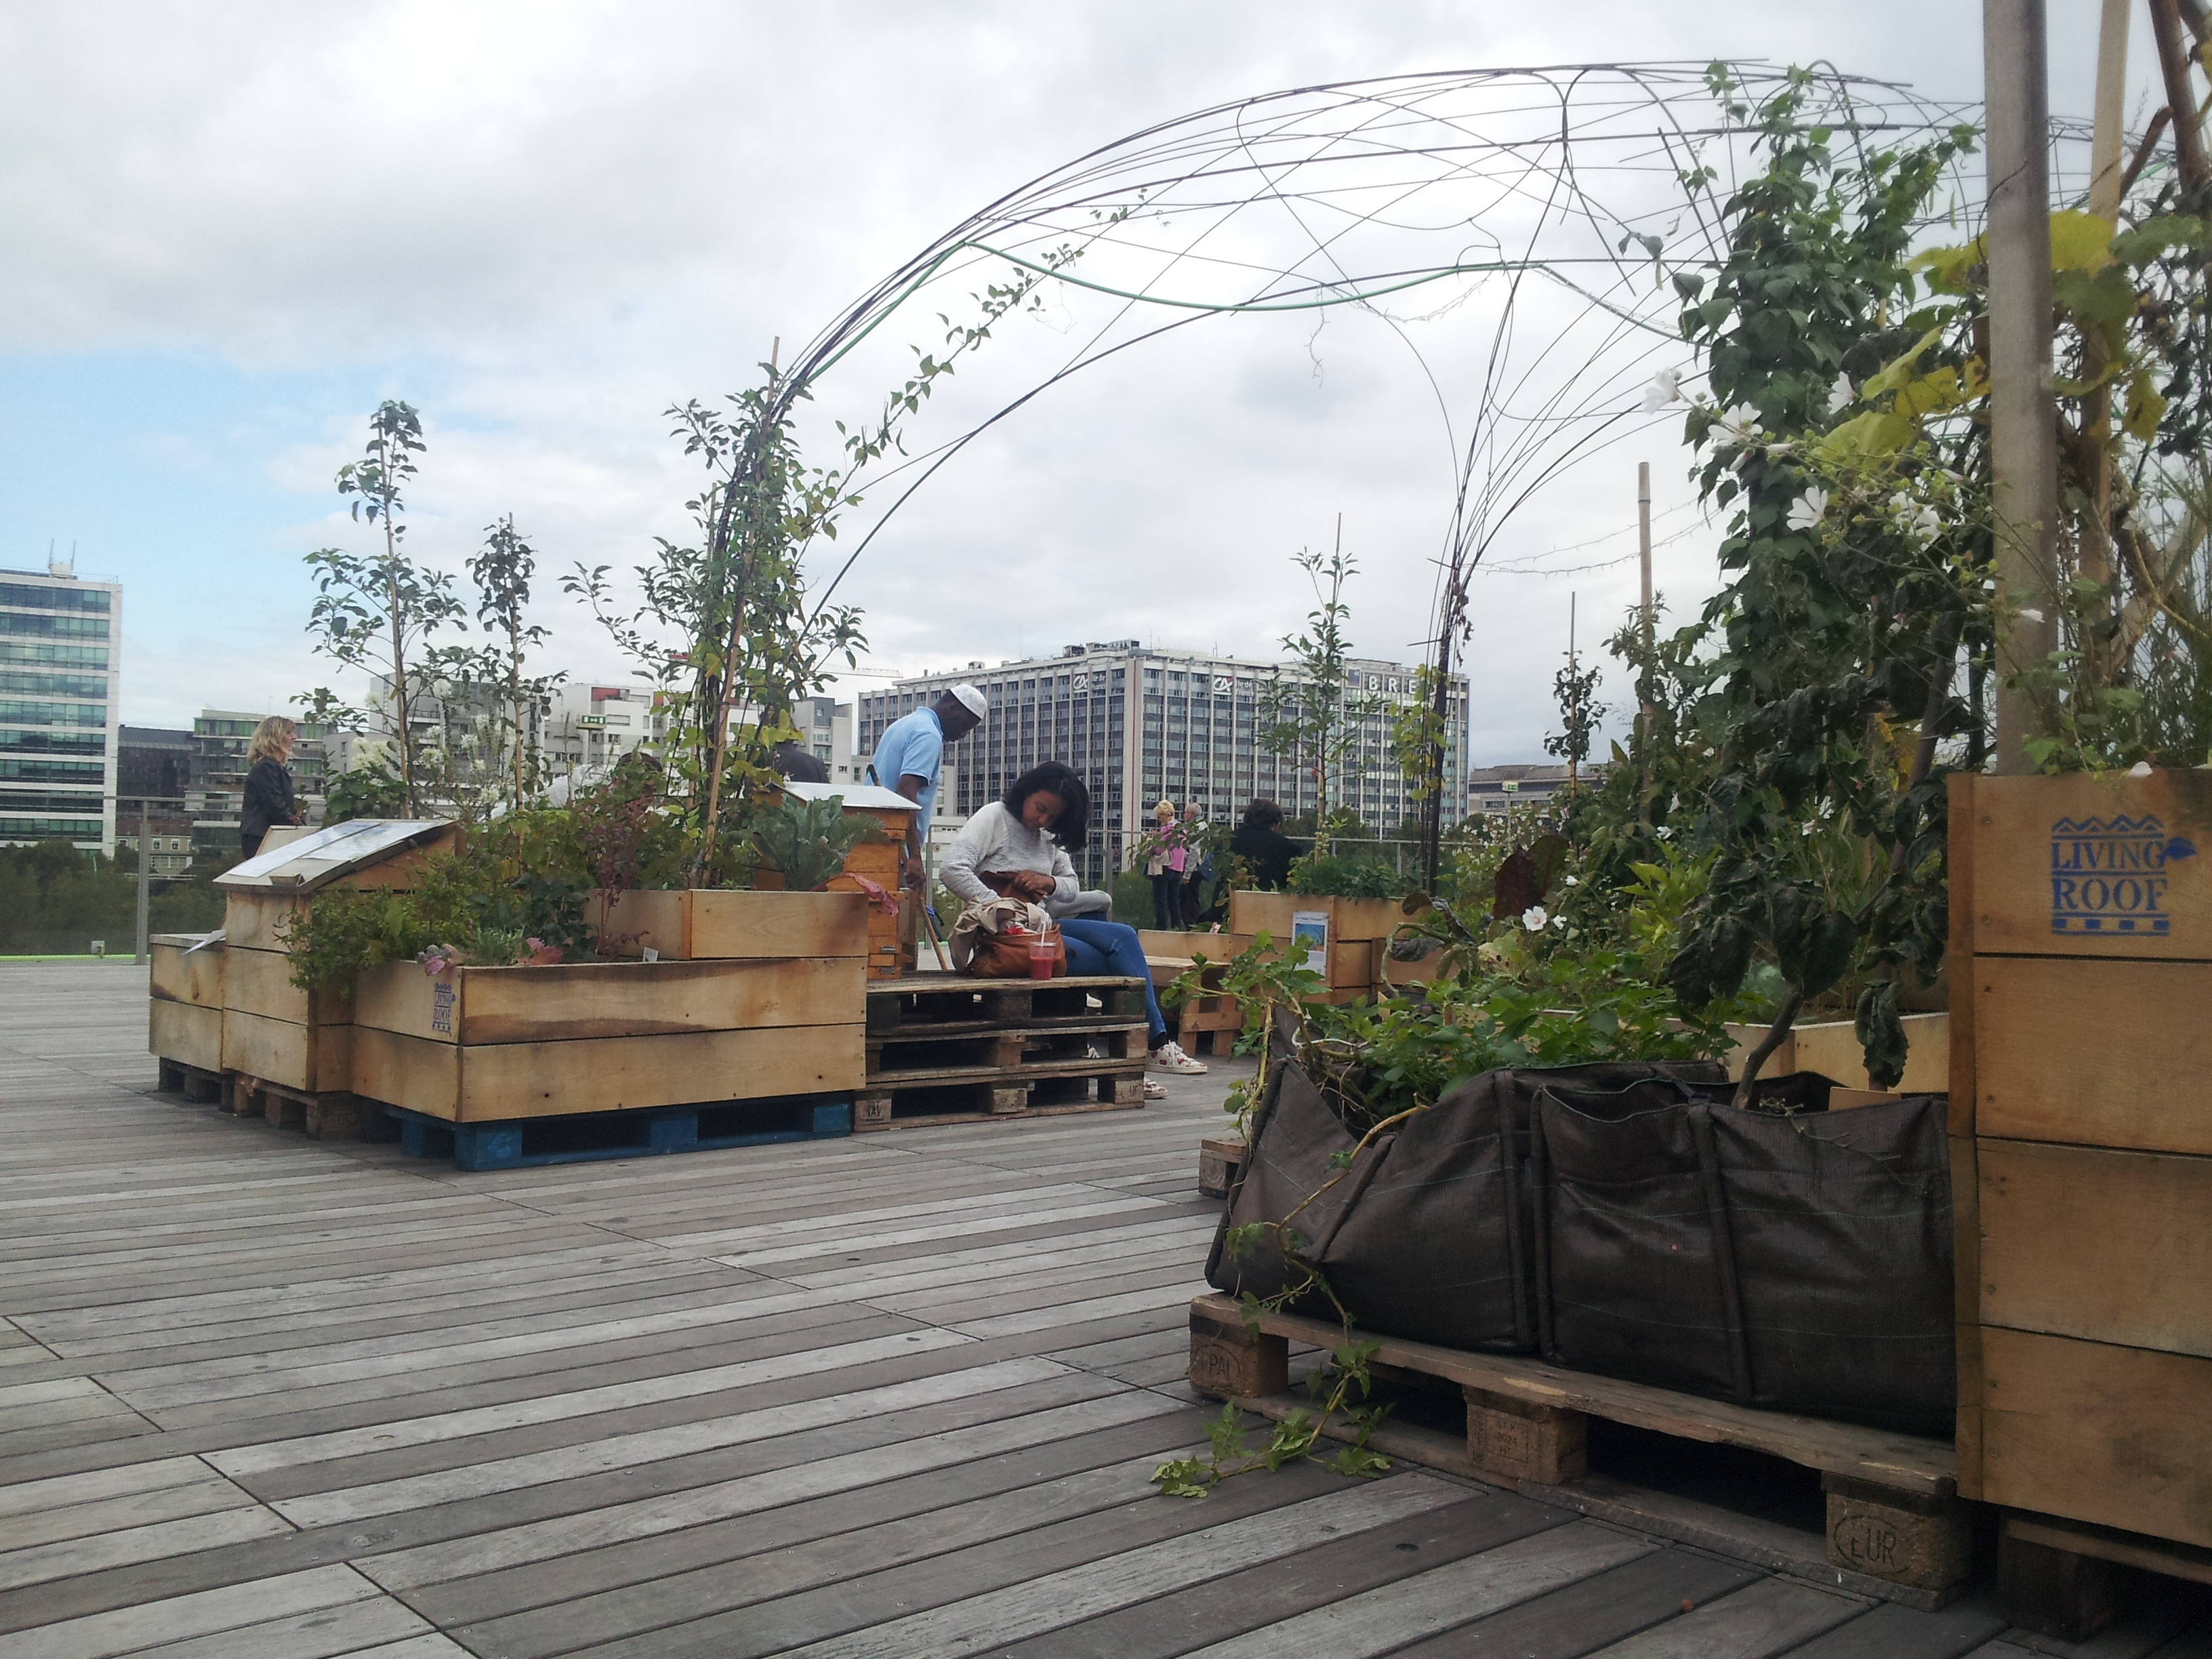 Basilic_en_ville_Living_Roof